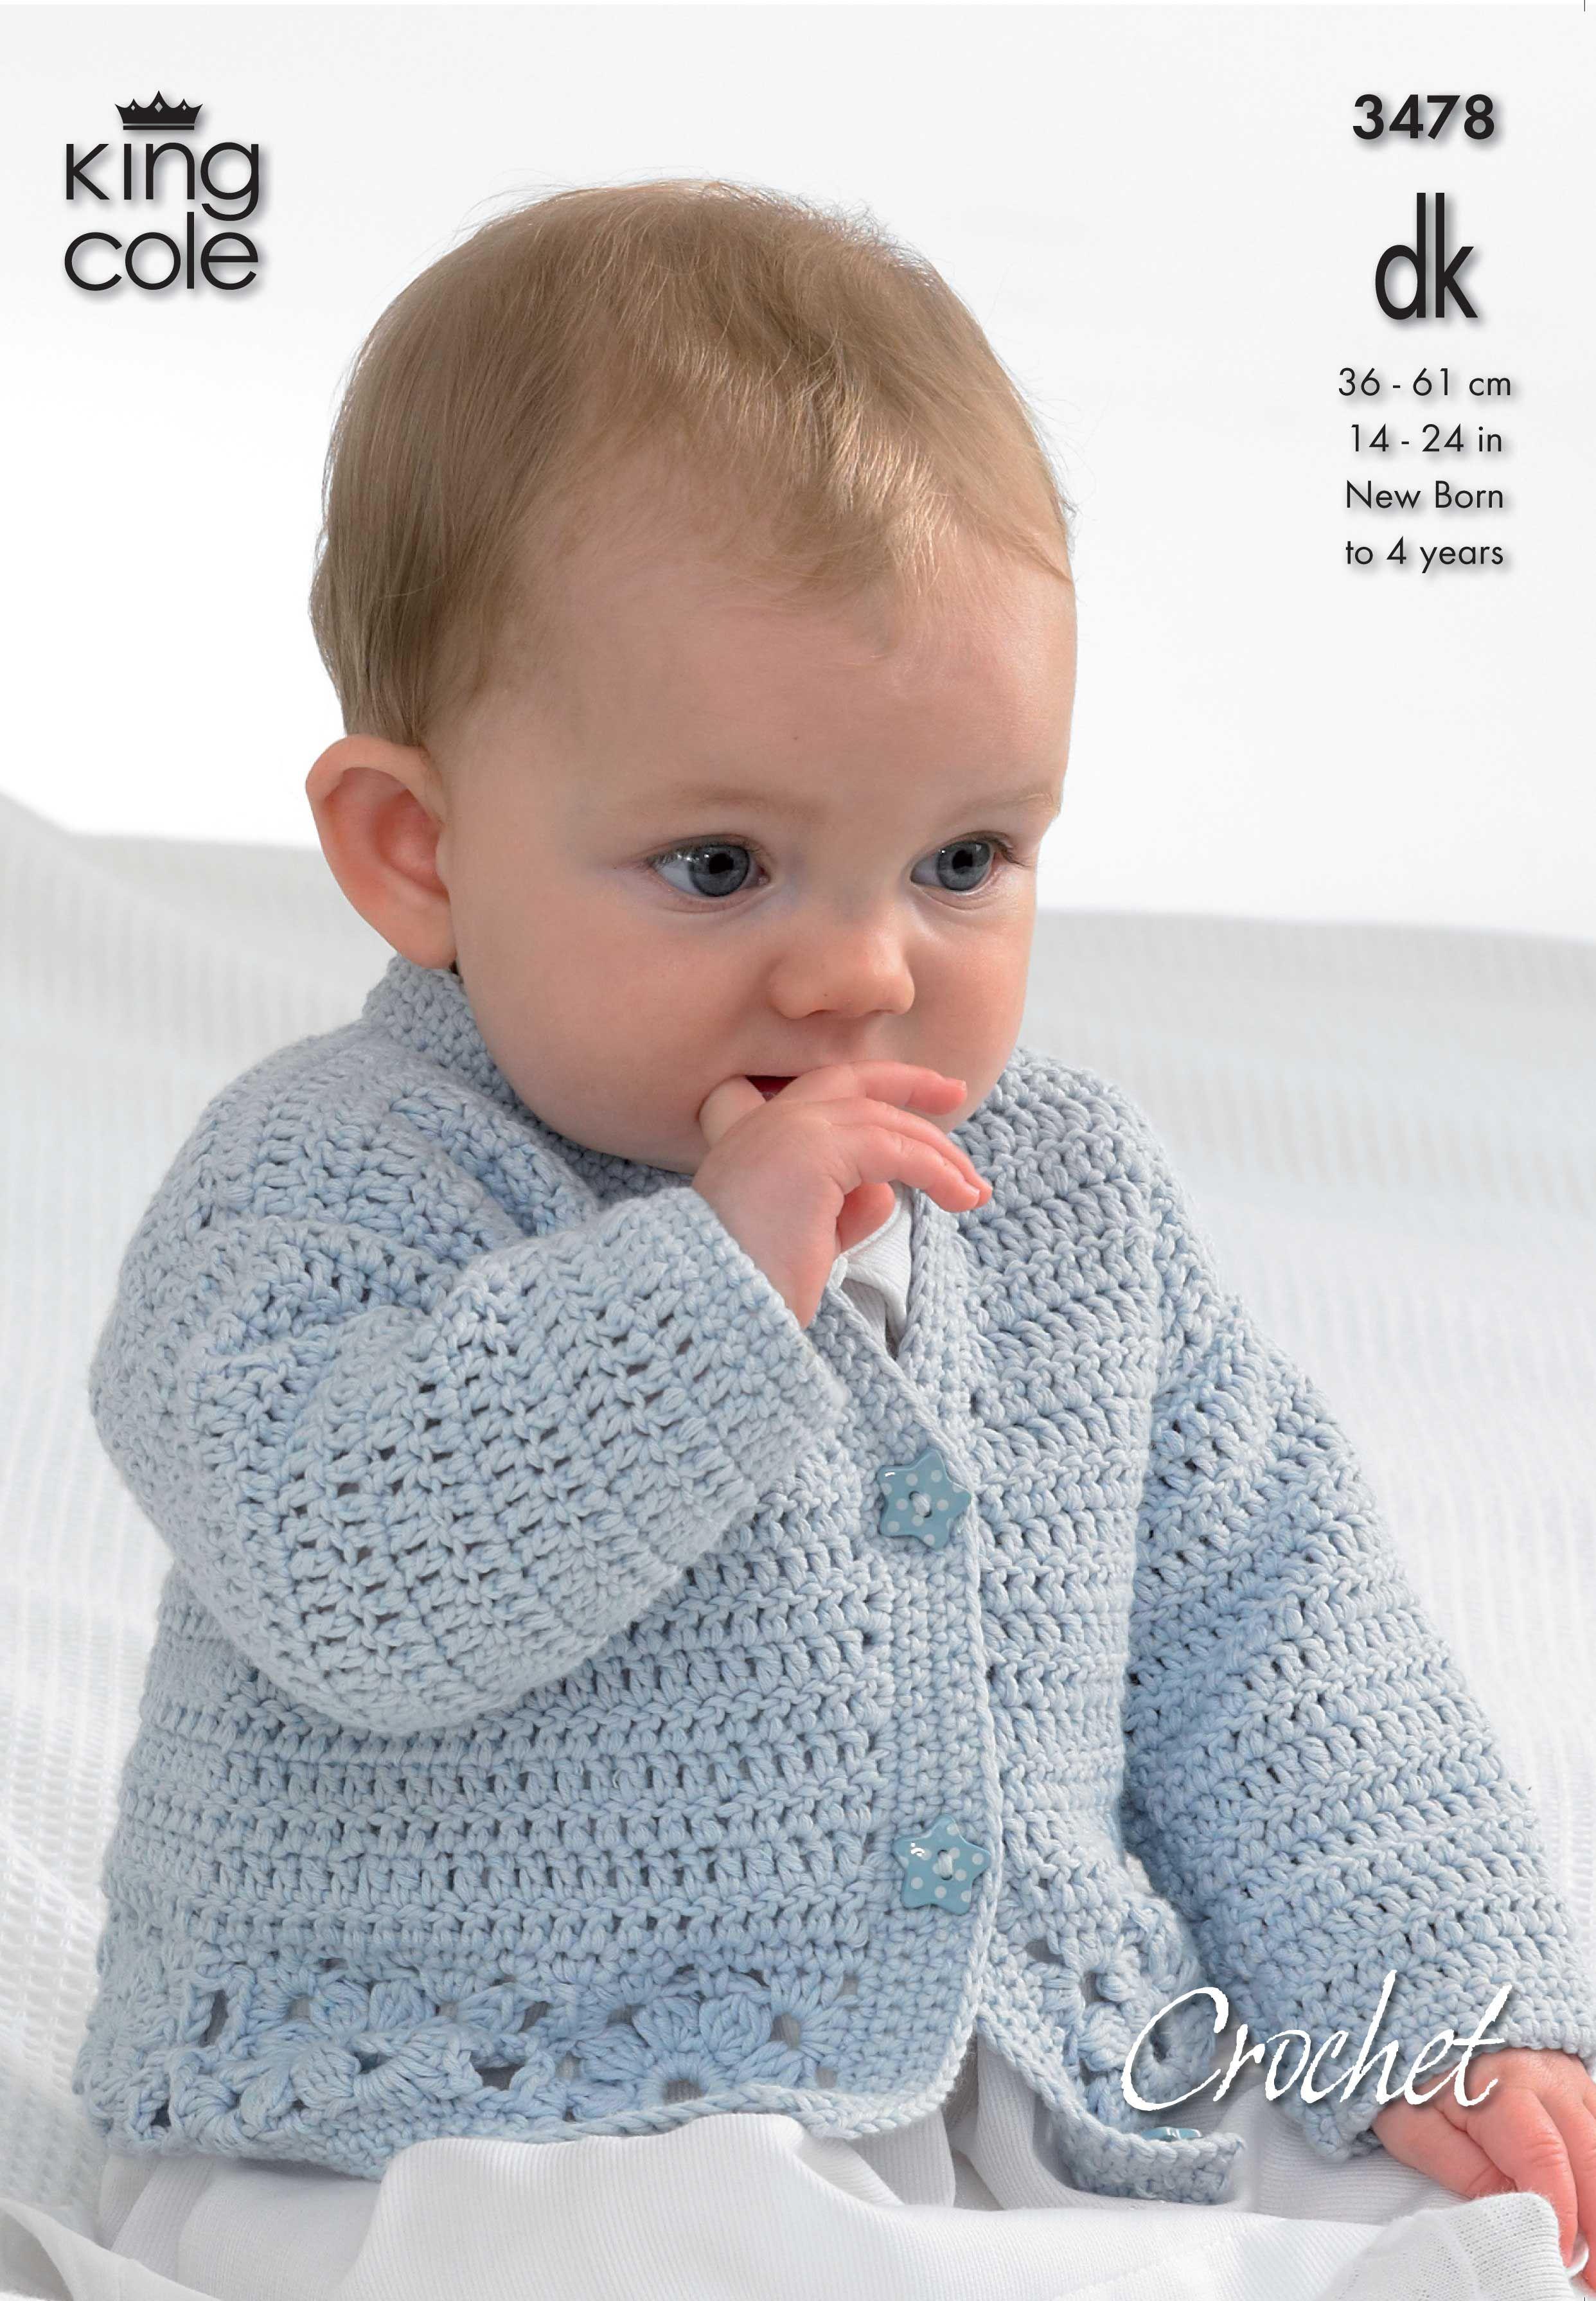 222469764 Crochet baby cardigan- King Cole